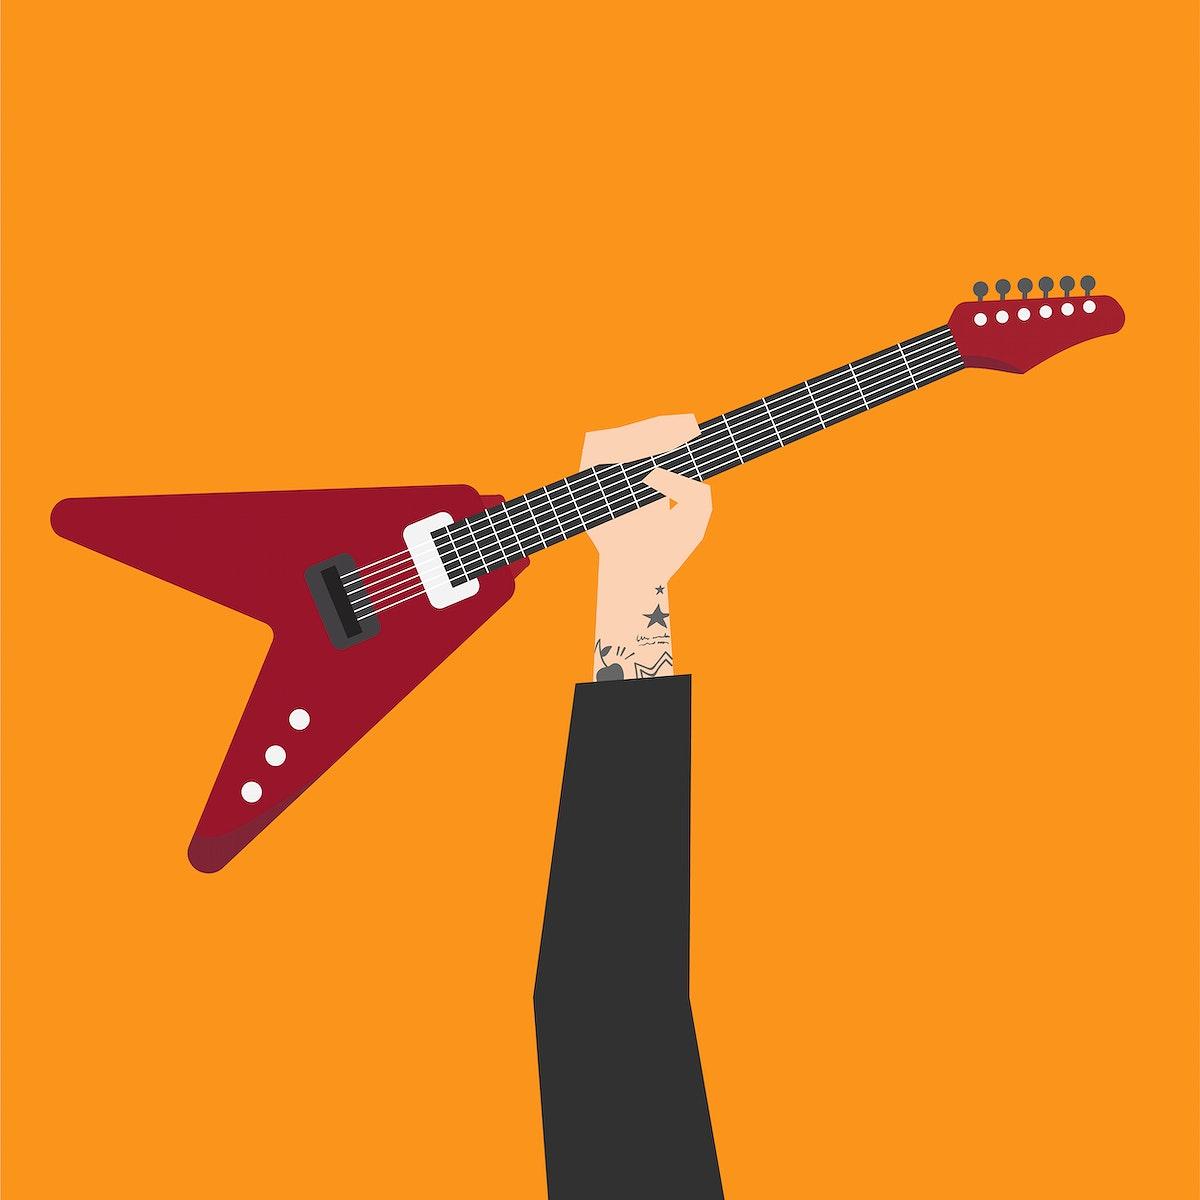 Hand holding electric guitar illustration